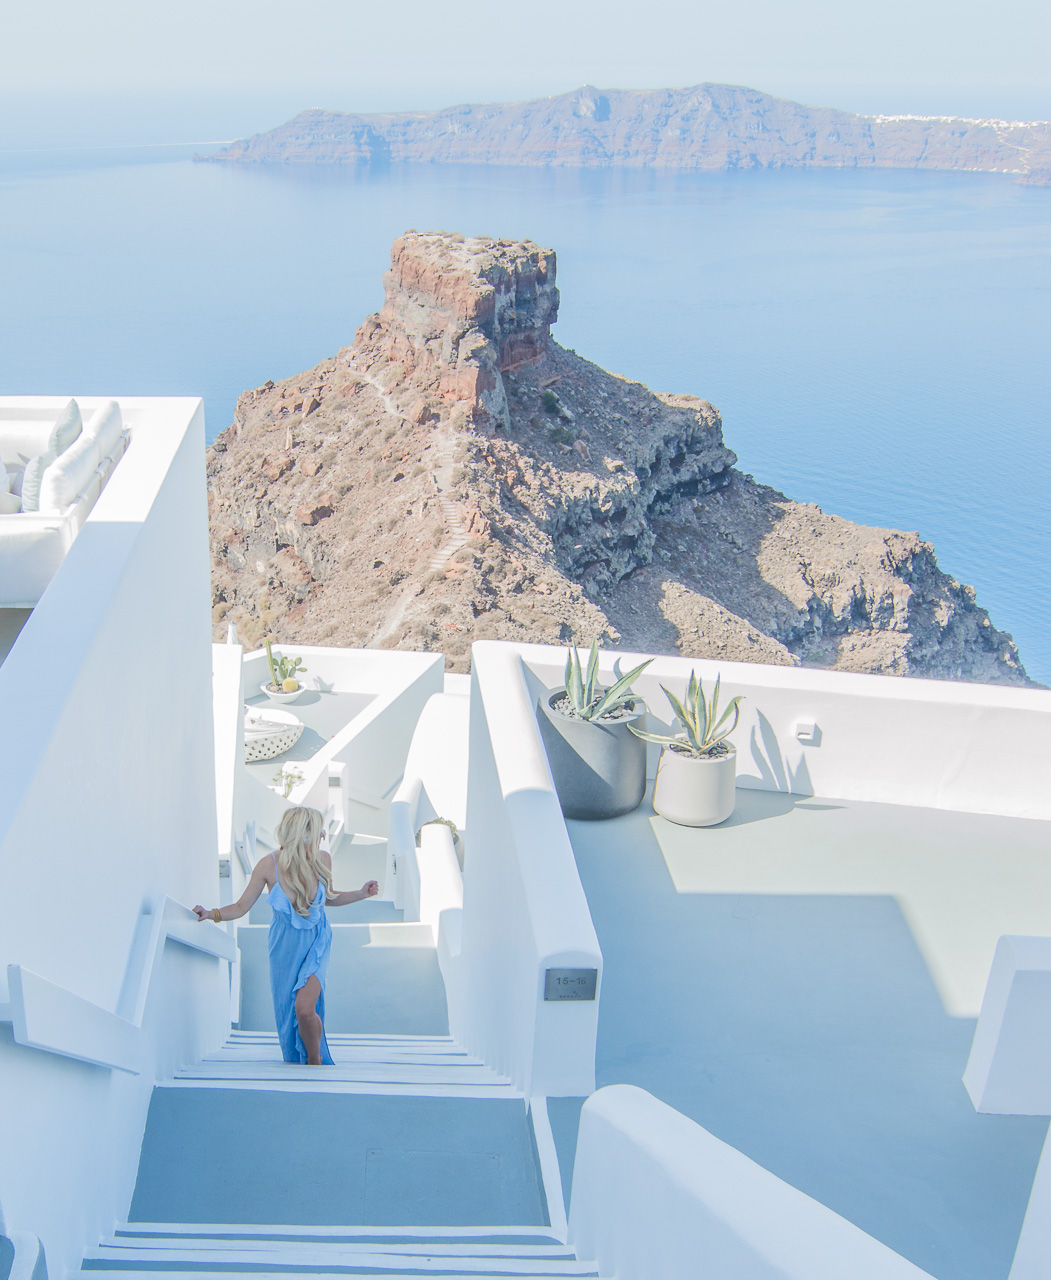 santorini-grace-hotel-caldera